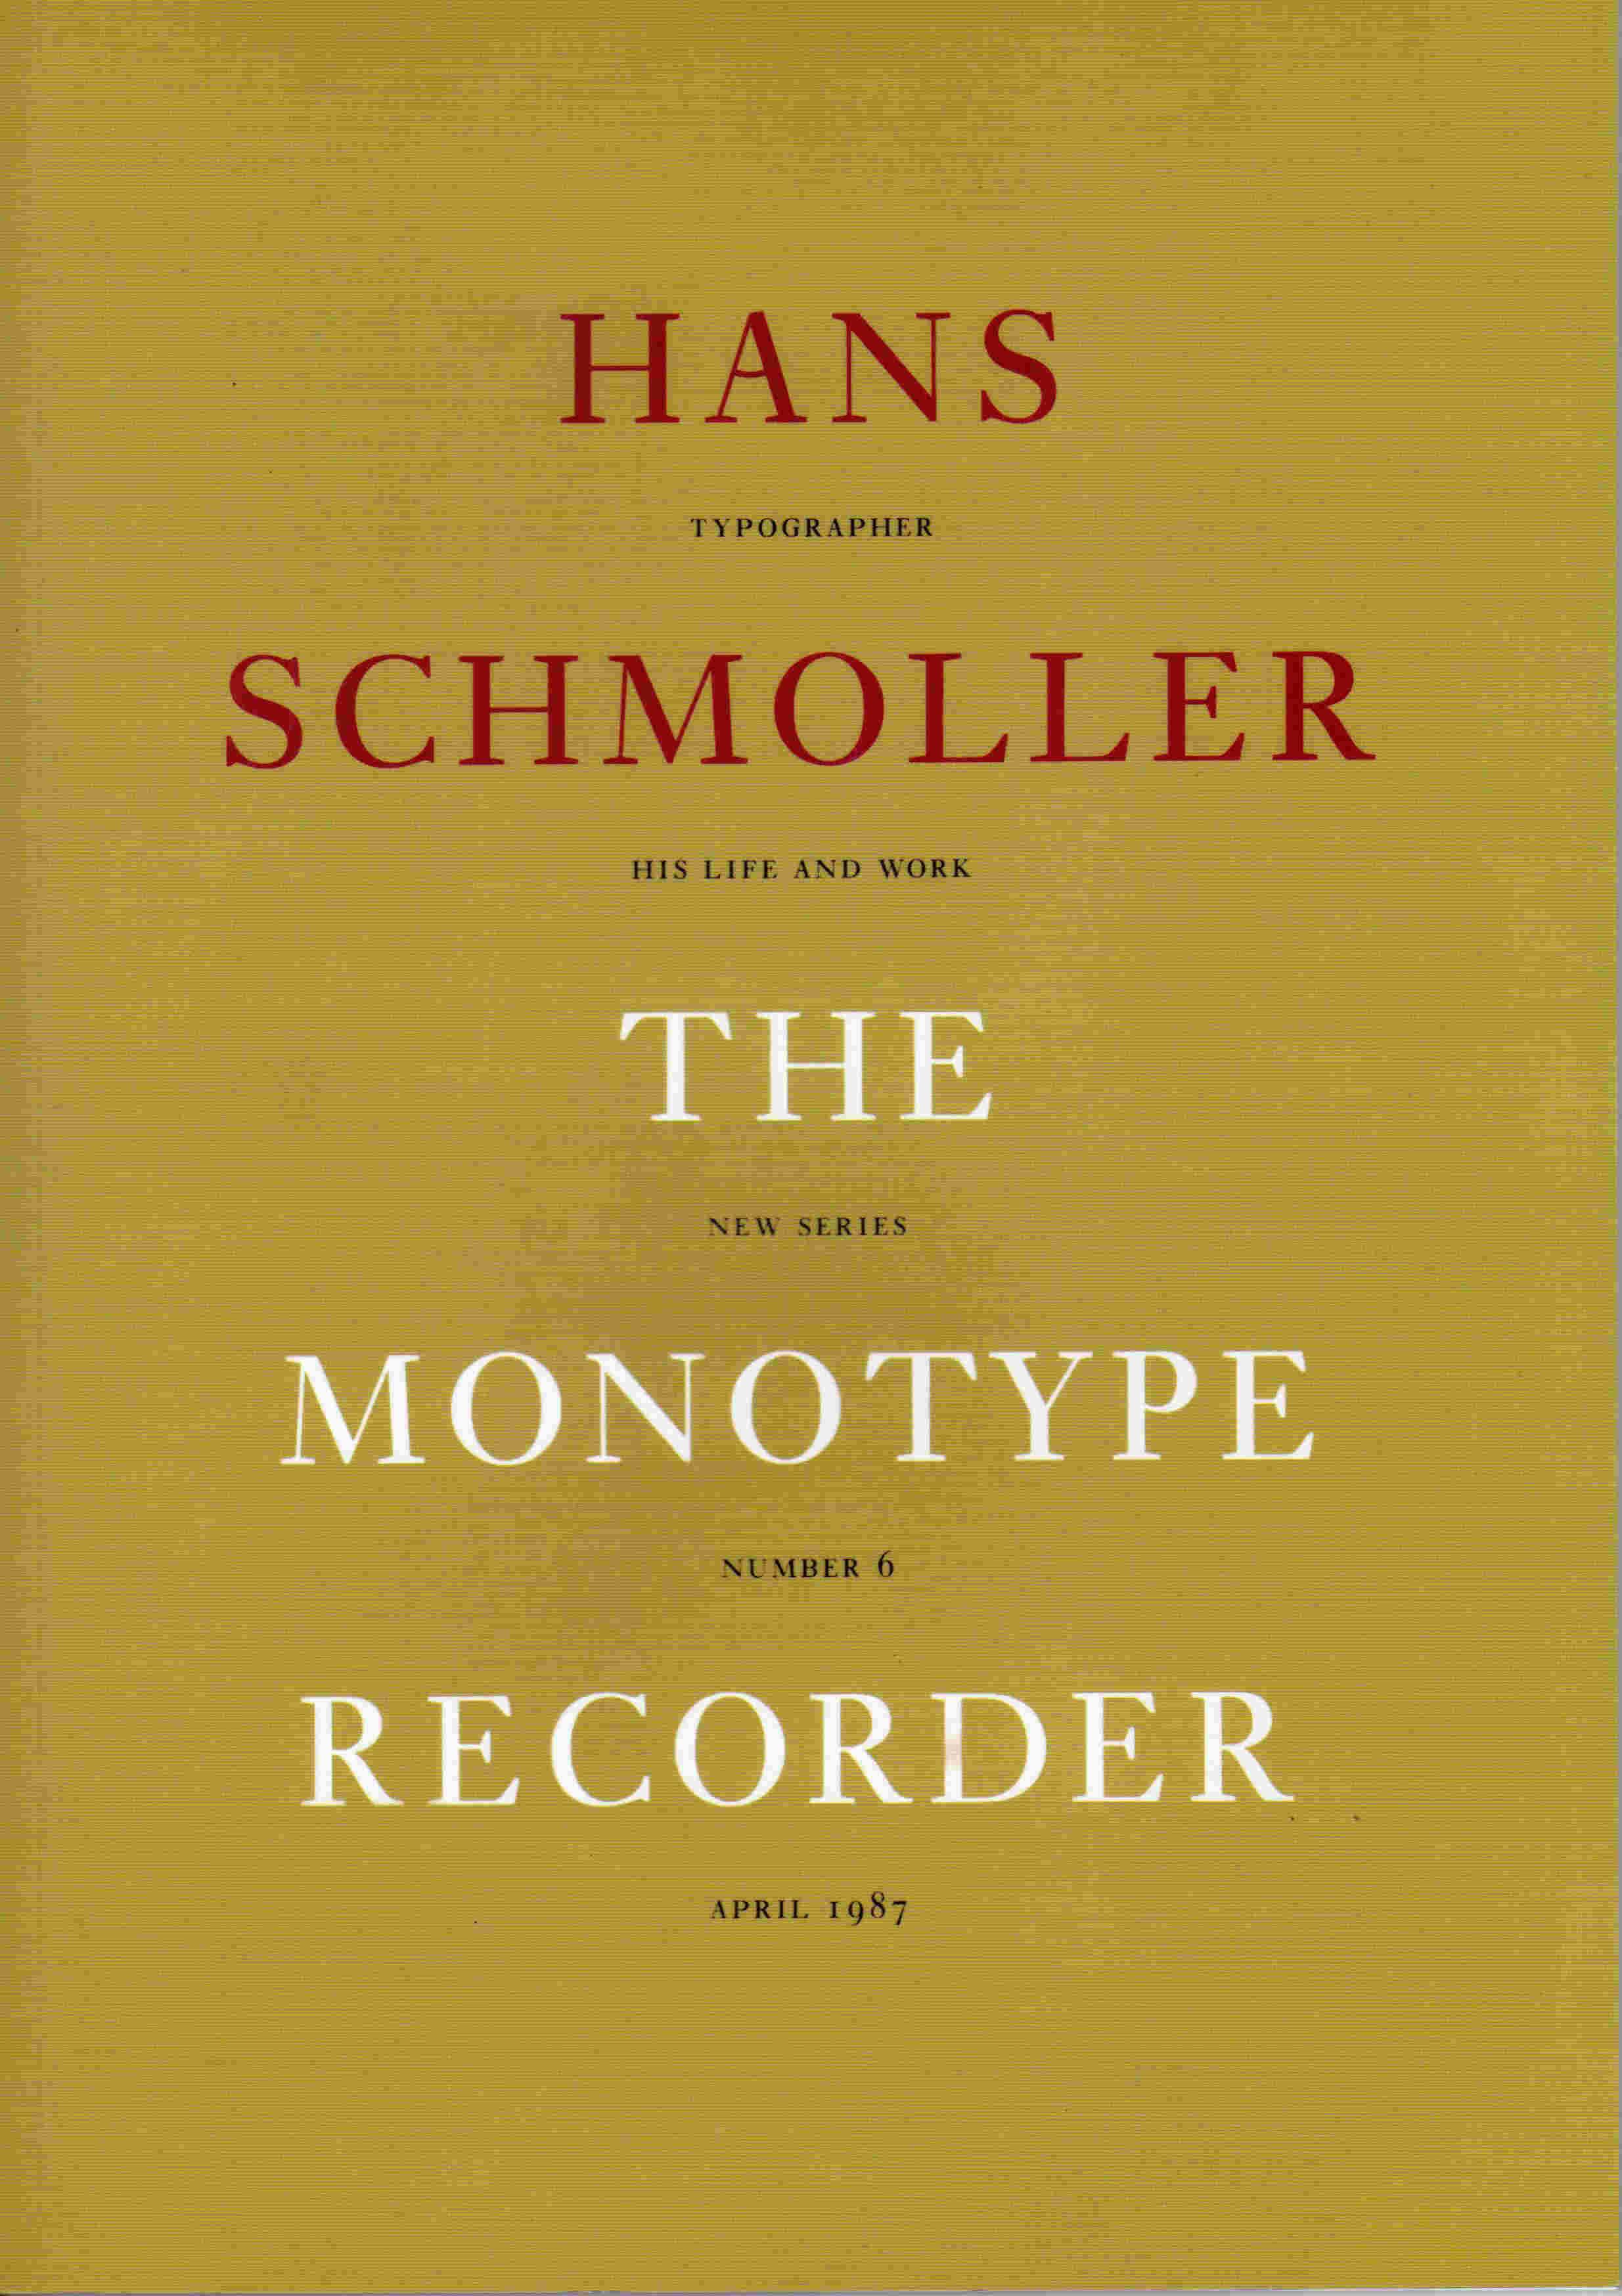 Hans Schmoller The Monotype Recorder Image 1